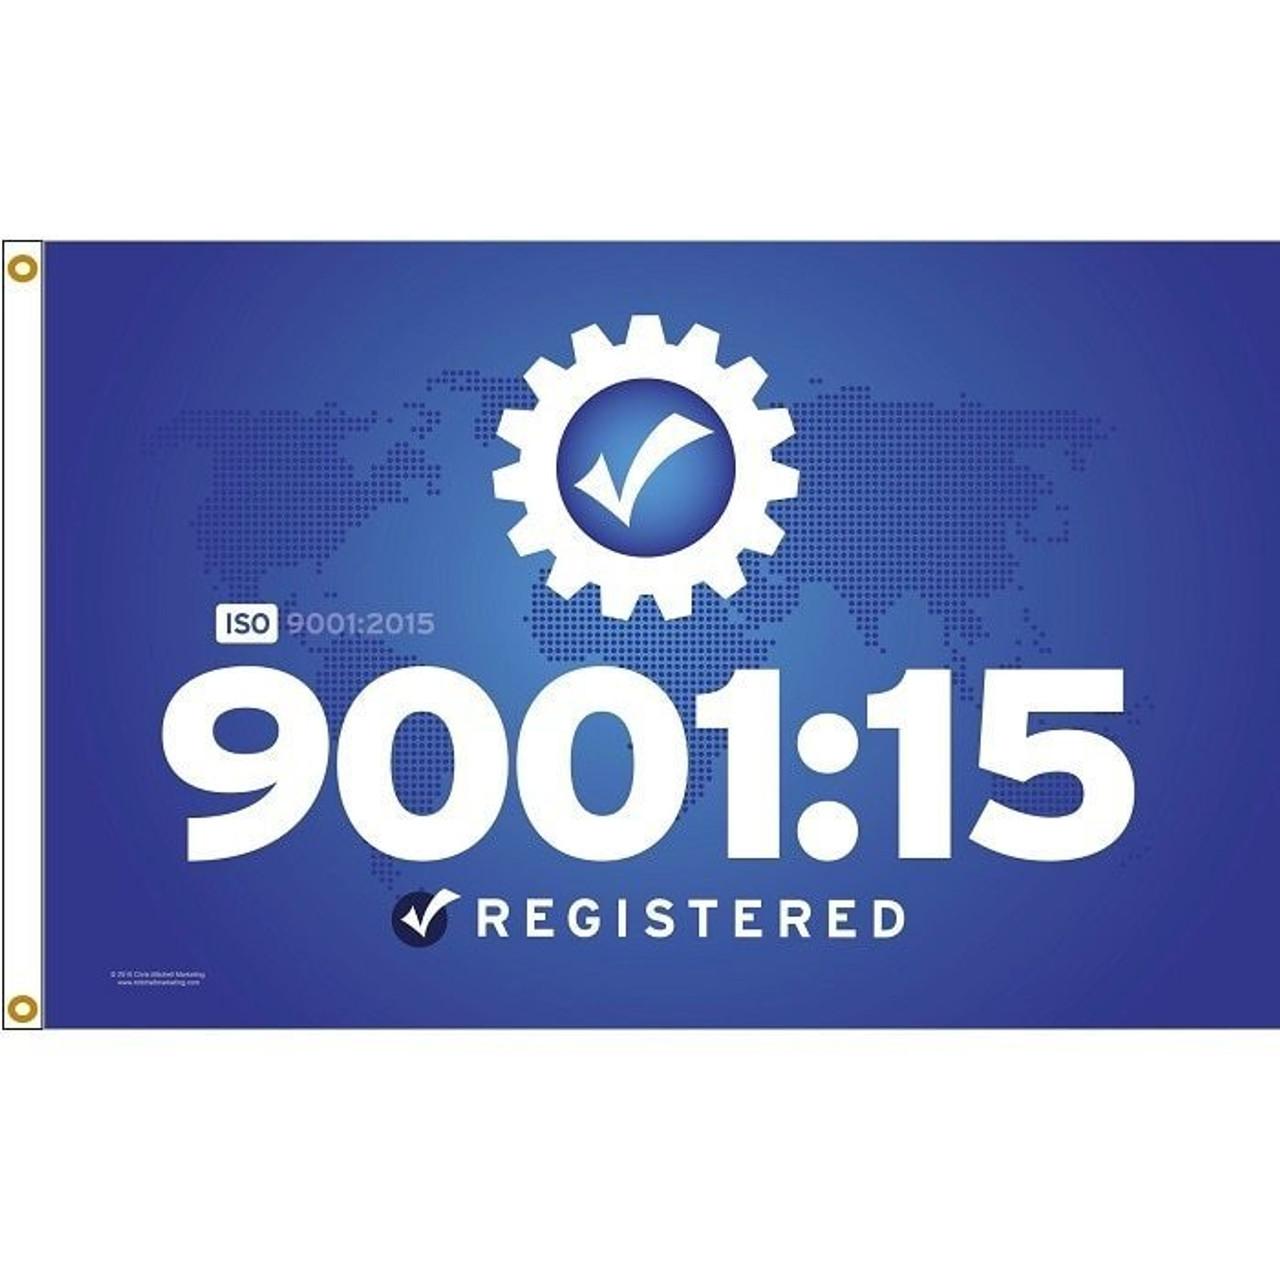 ISO 900115 Flag